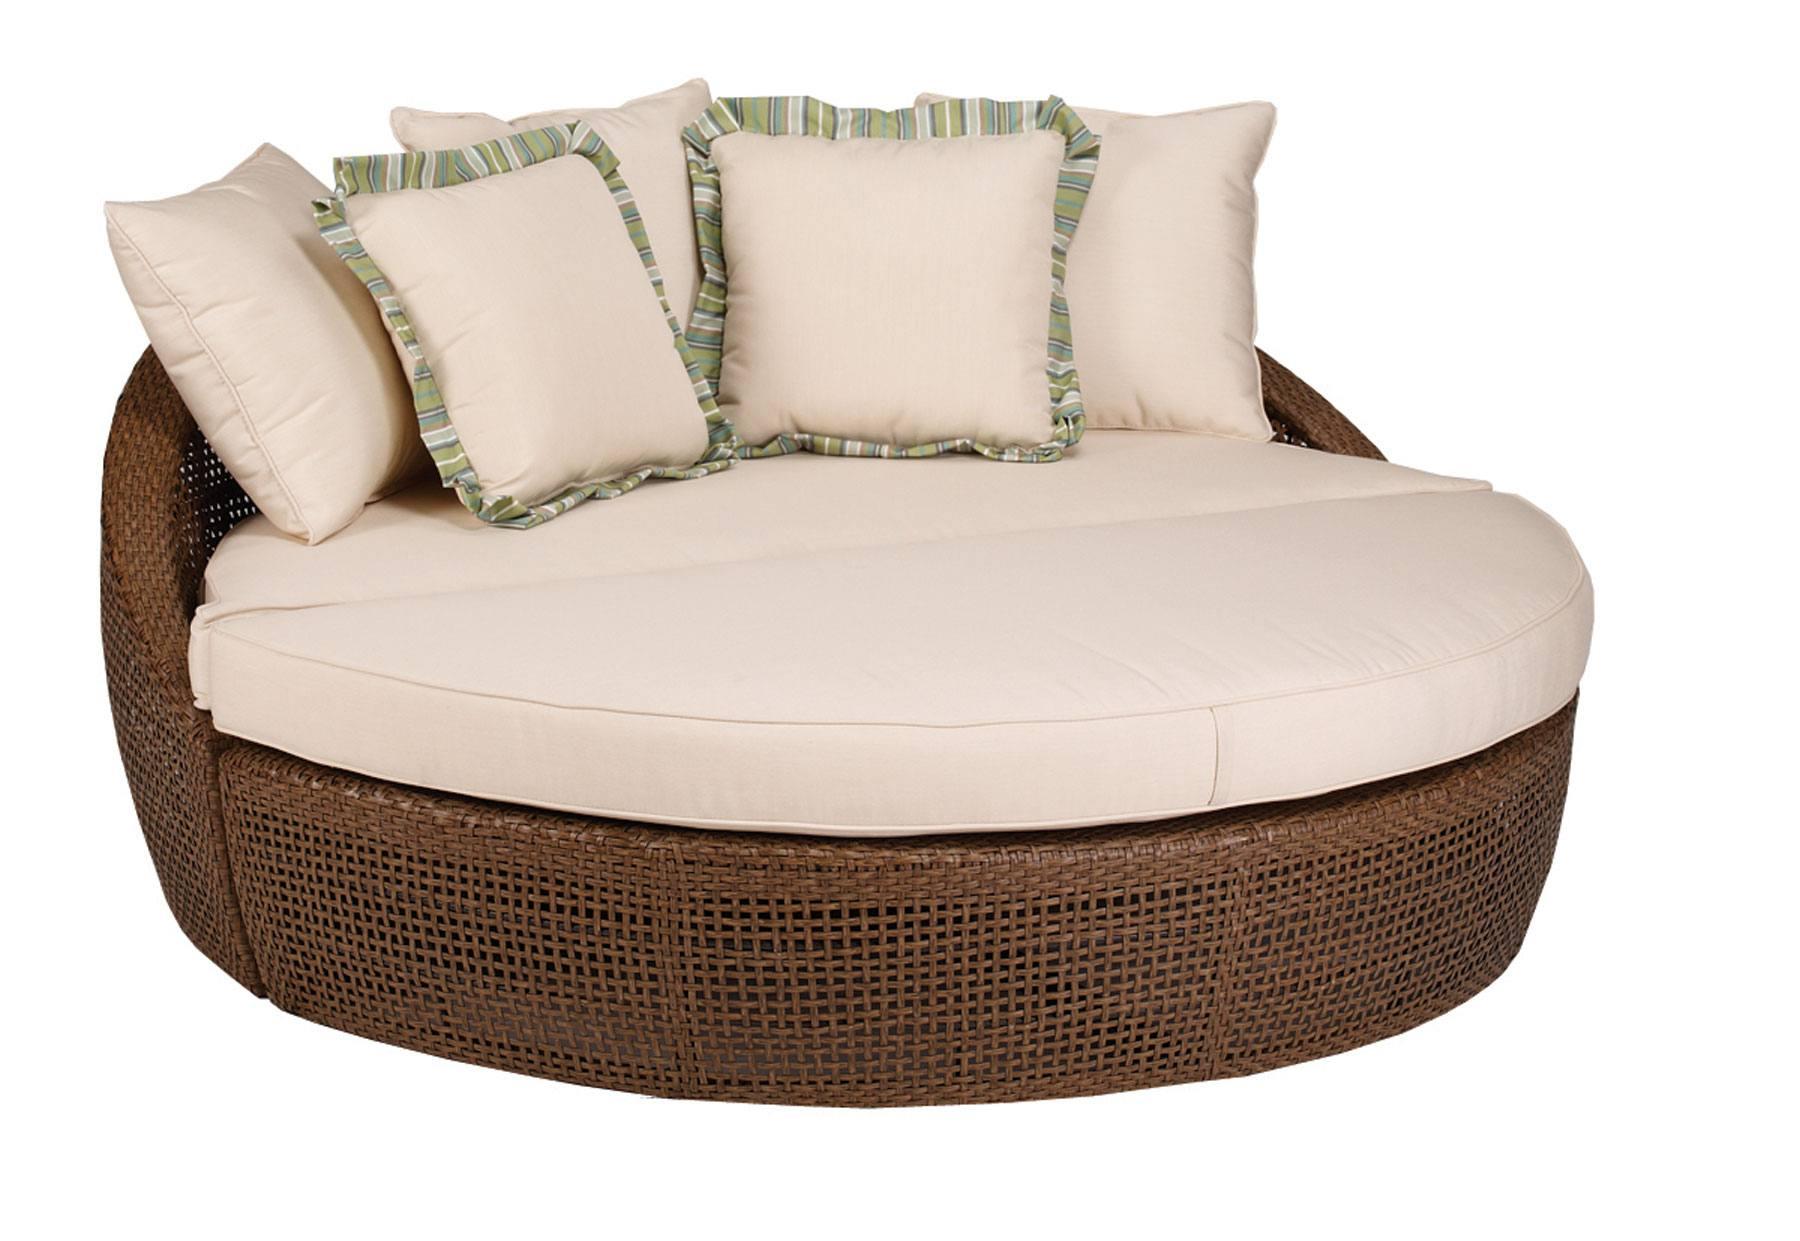 Enjoyable Chaise Lounge Chair Outdoor Bangkokfoodietour Com Ibusinesslaw Wood Chair Design Ideas Ibusinesslaworg